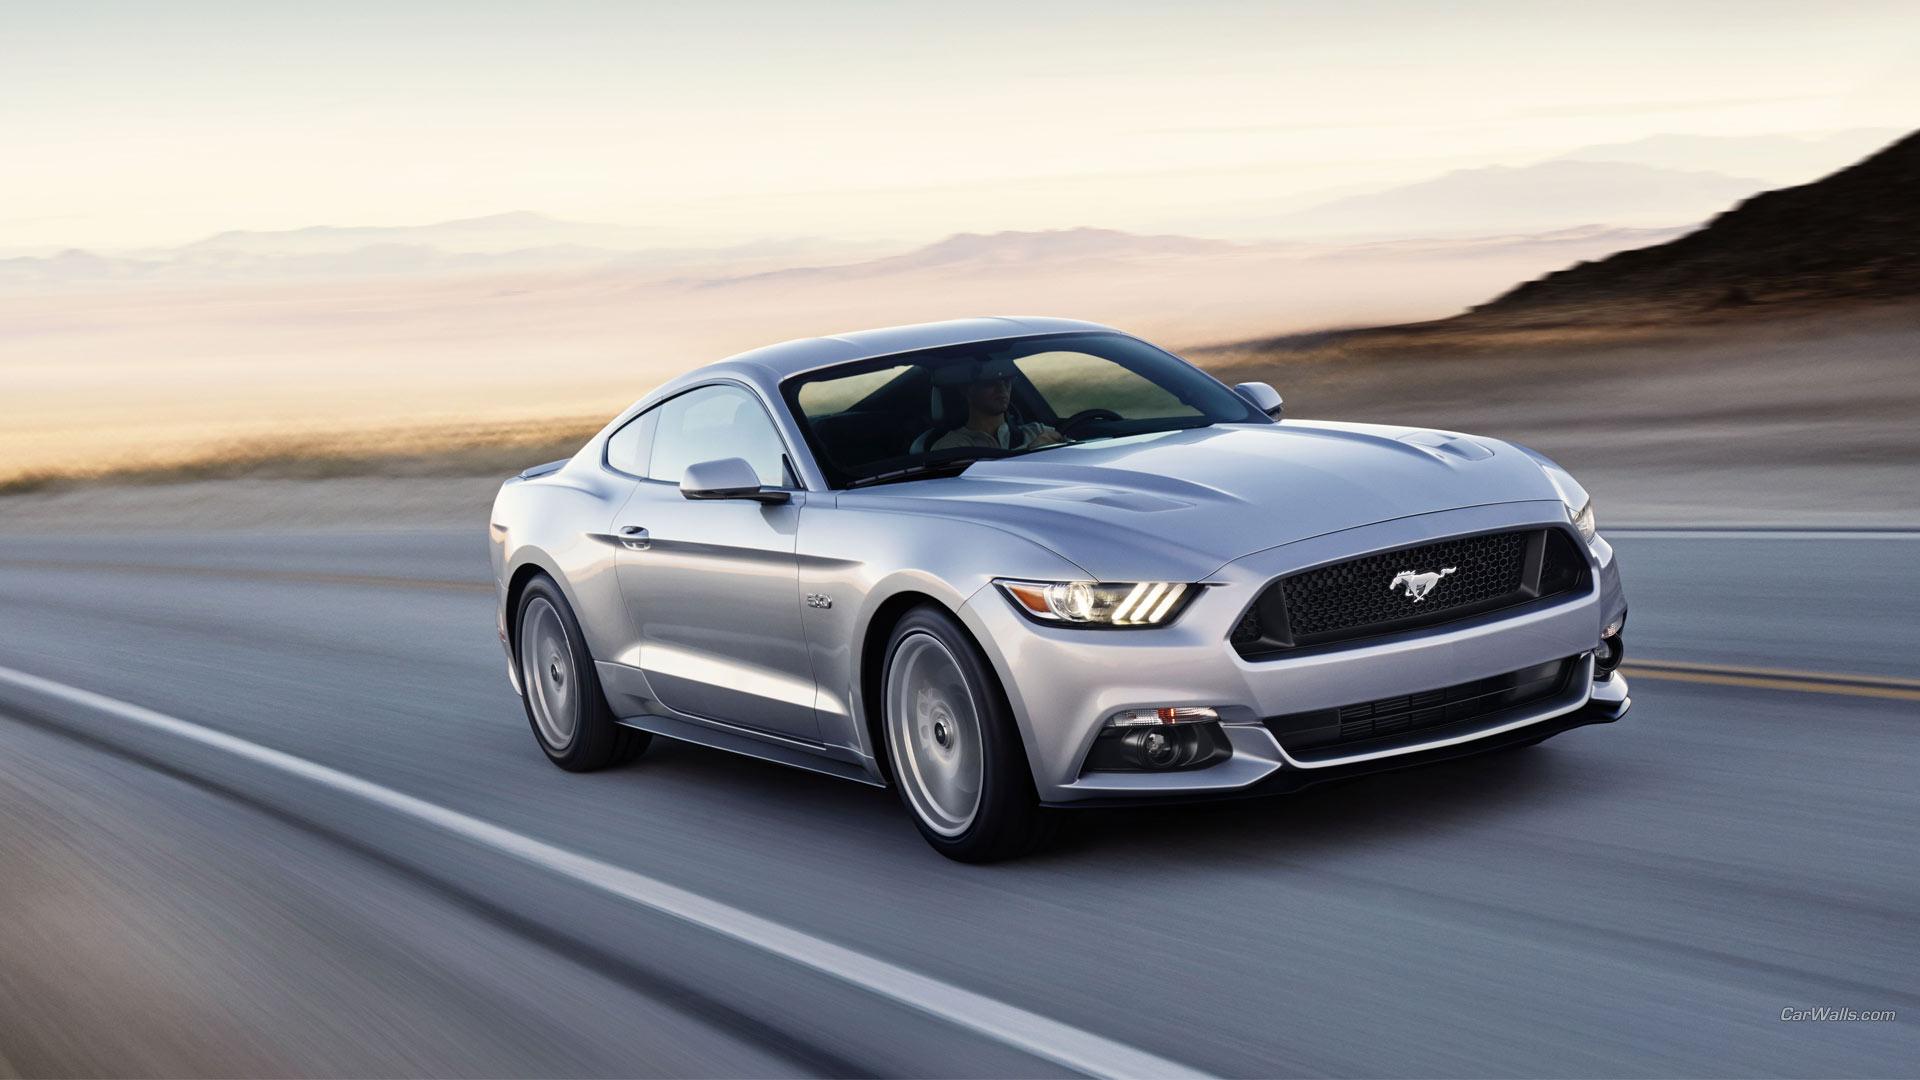 2015 Ford Mustang Gt Fondo De Pantalla Hd Fondo De